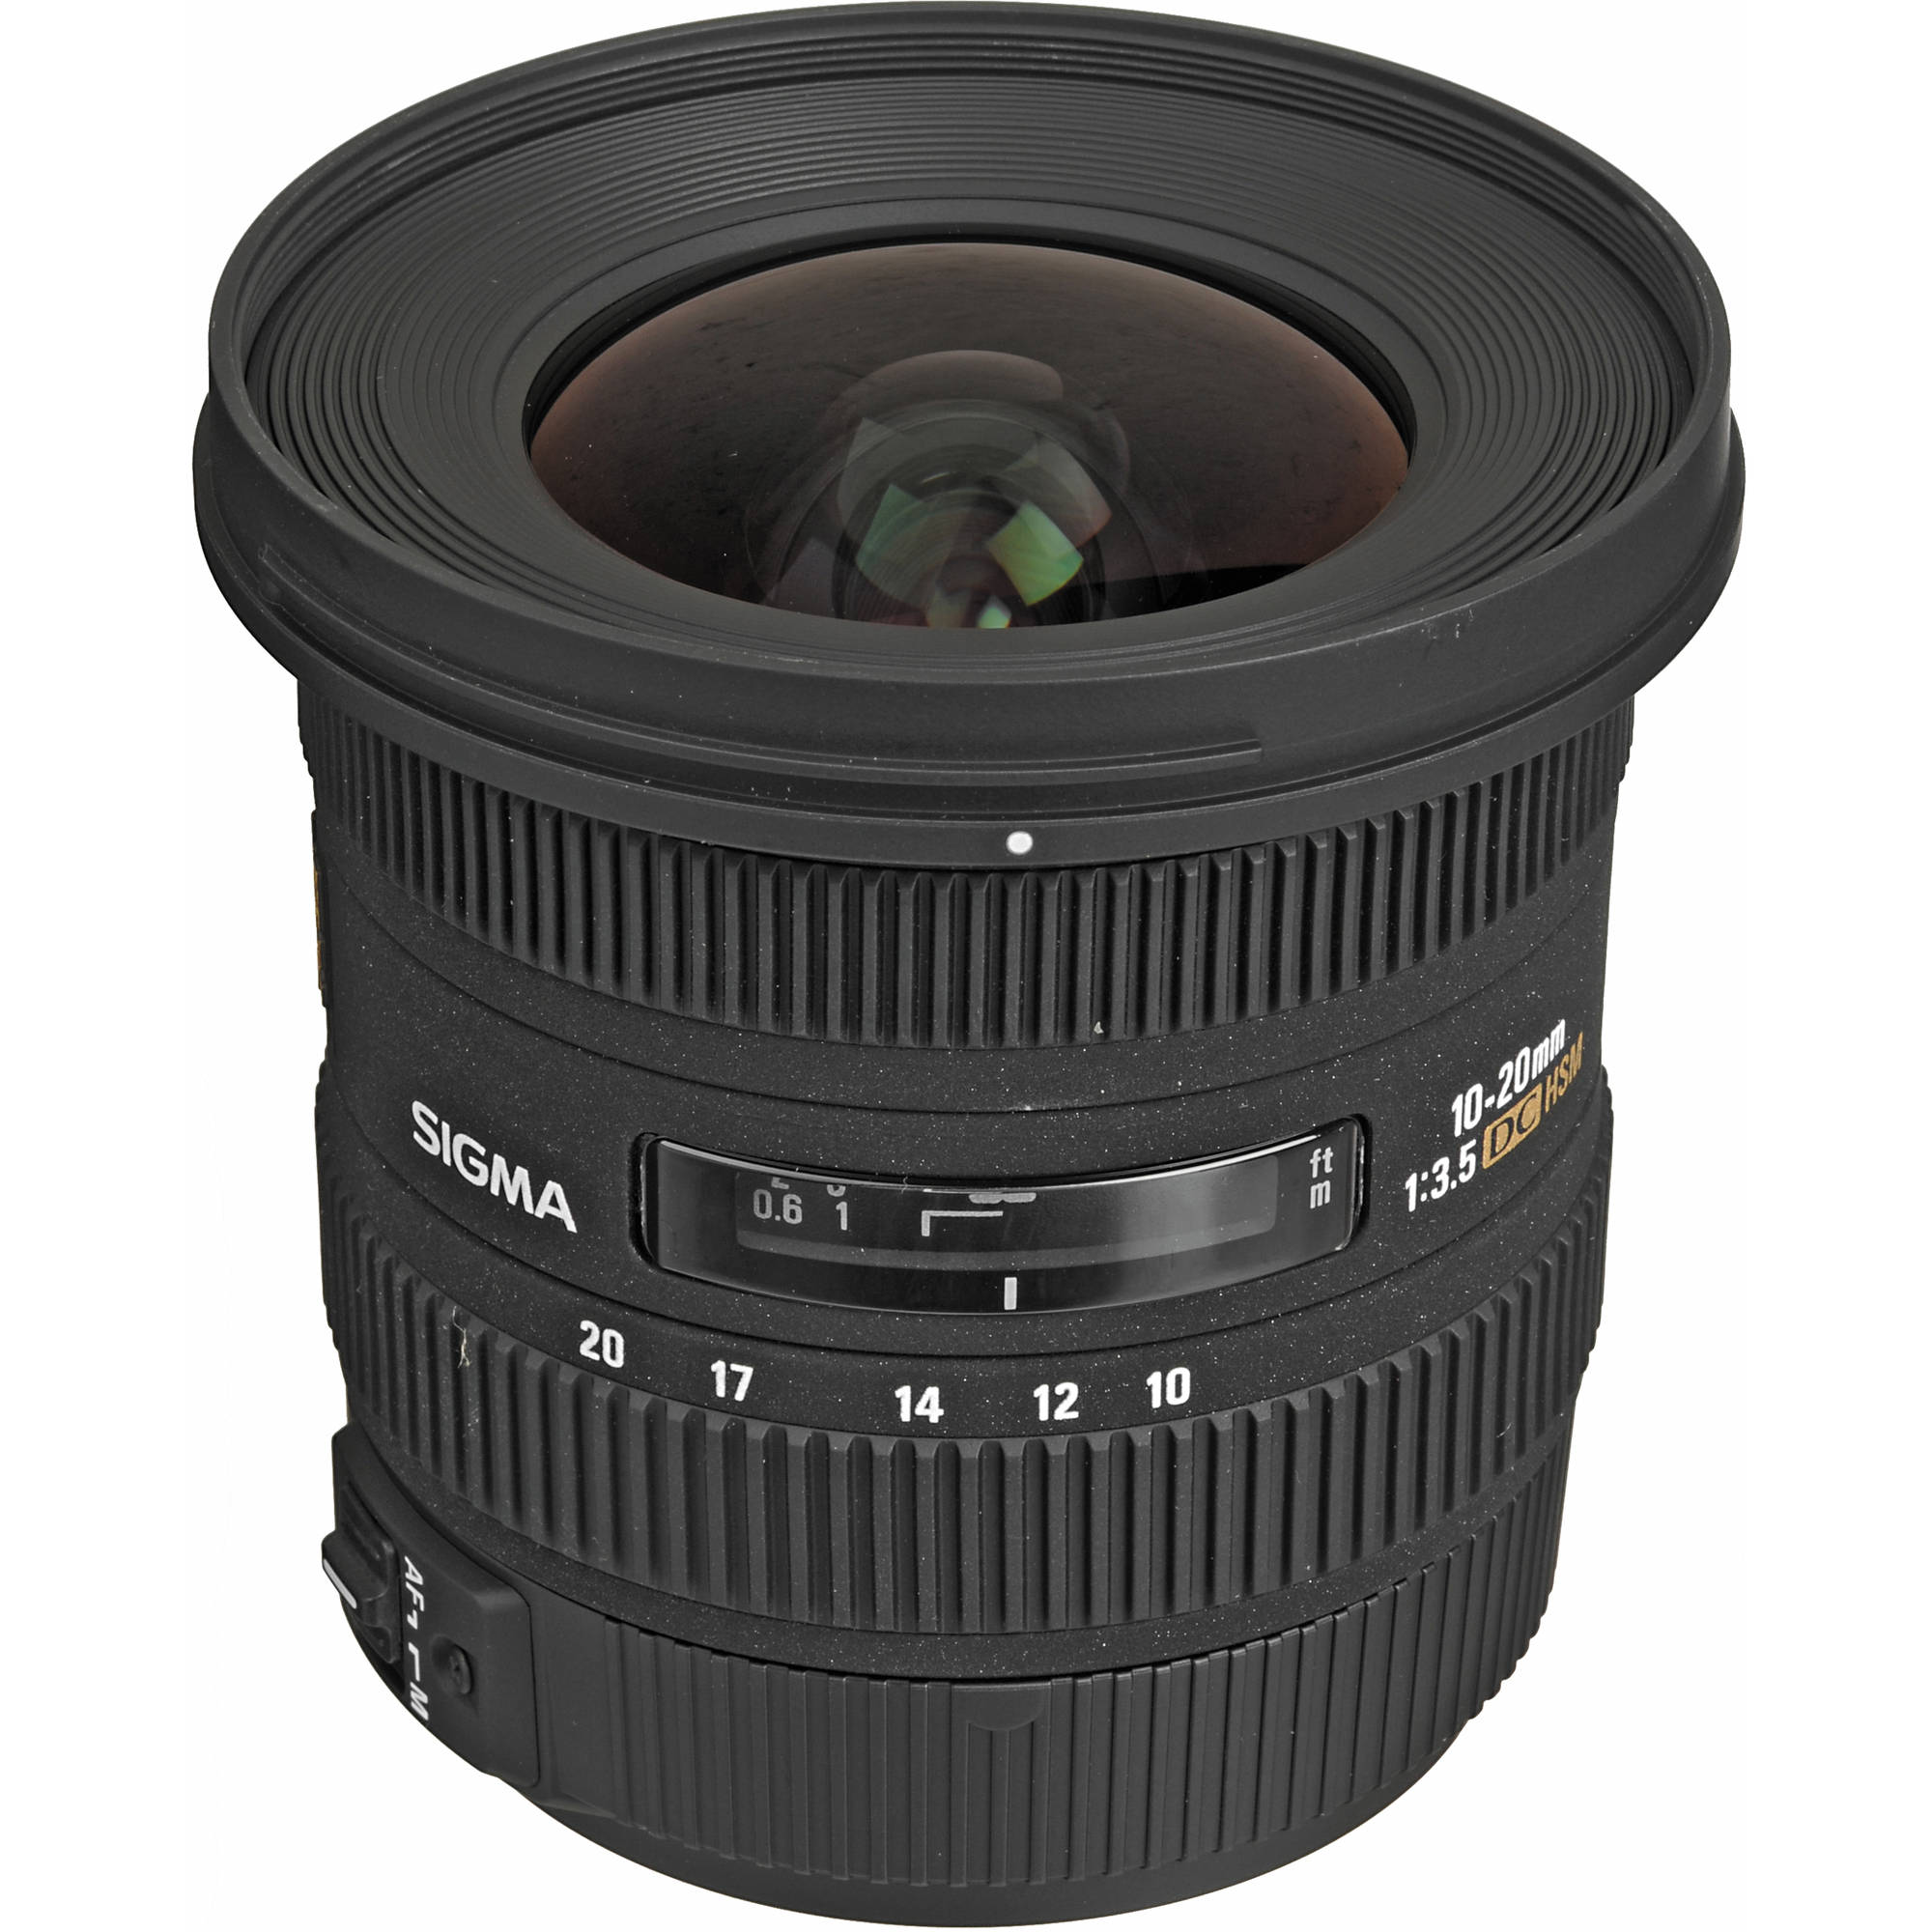 Gadget Career Front Lens Cap for Sigma 10-20mm F3.5 EX DC HSM